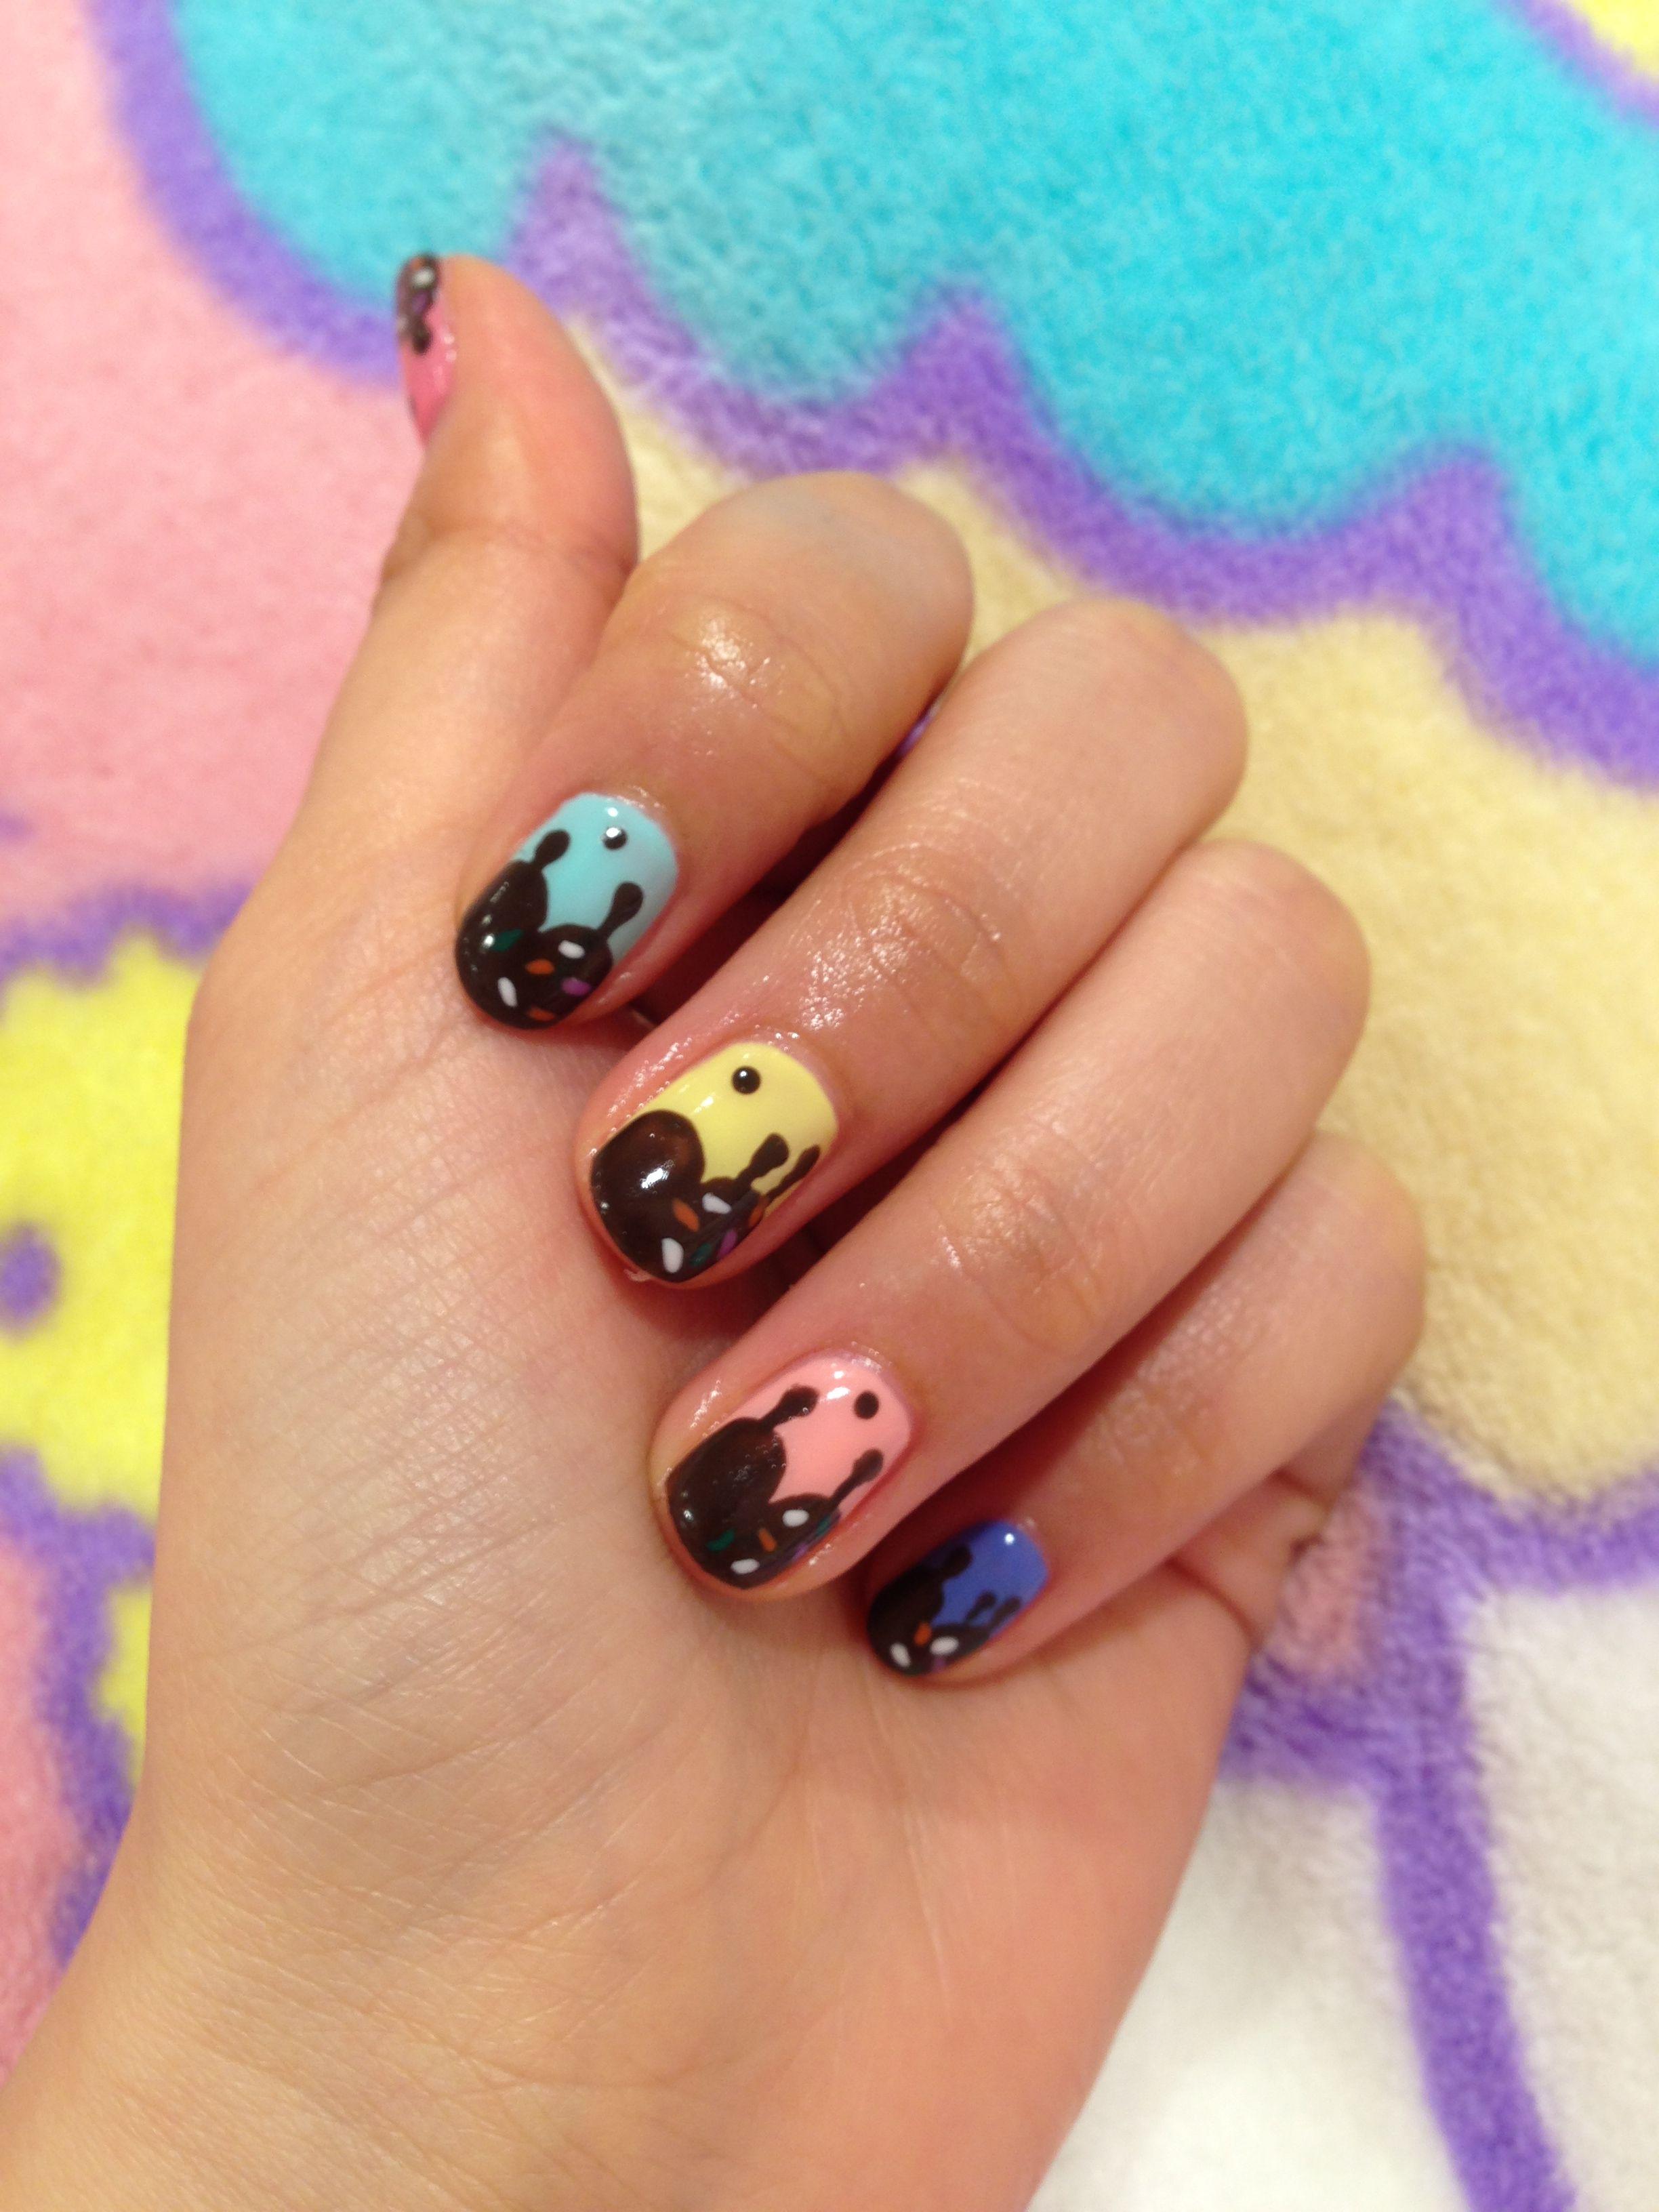 Kawaii Nails   Nail designs   Pinterest   Uñas kawaii y Kawaii